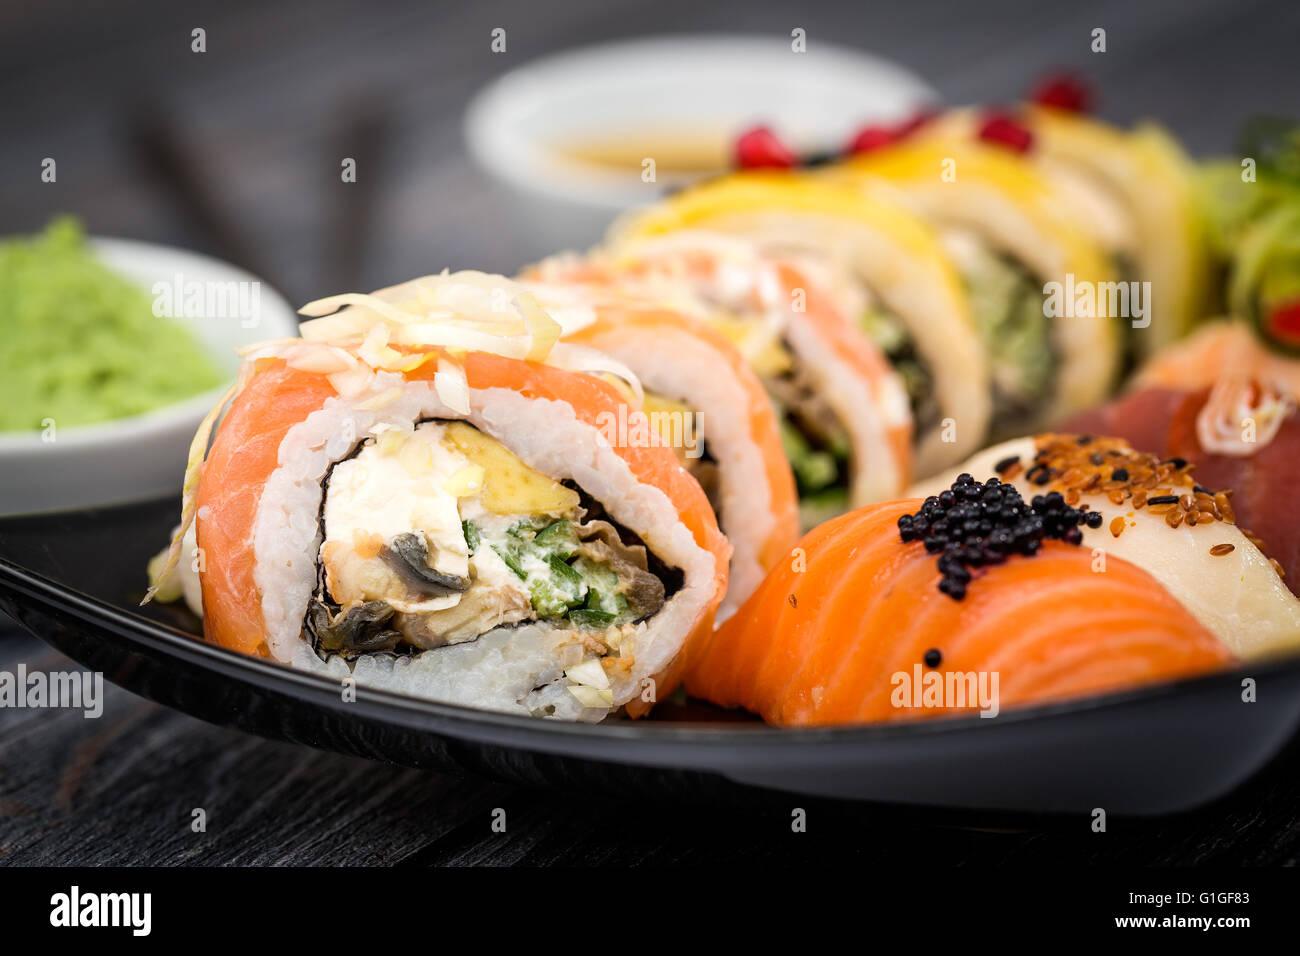 Sushi Rollen roh Makki frische Meeresfrüchte Susi - stock Bild Stockbild